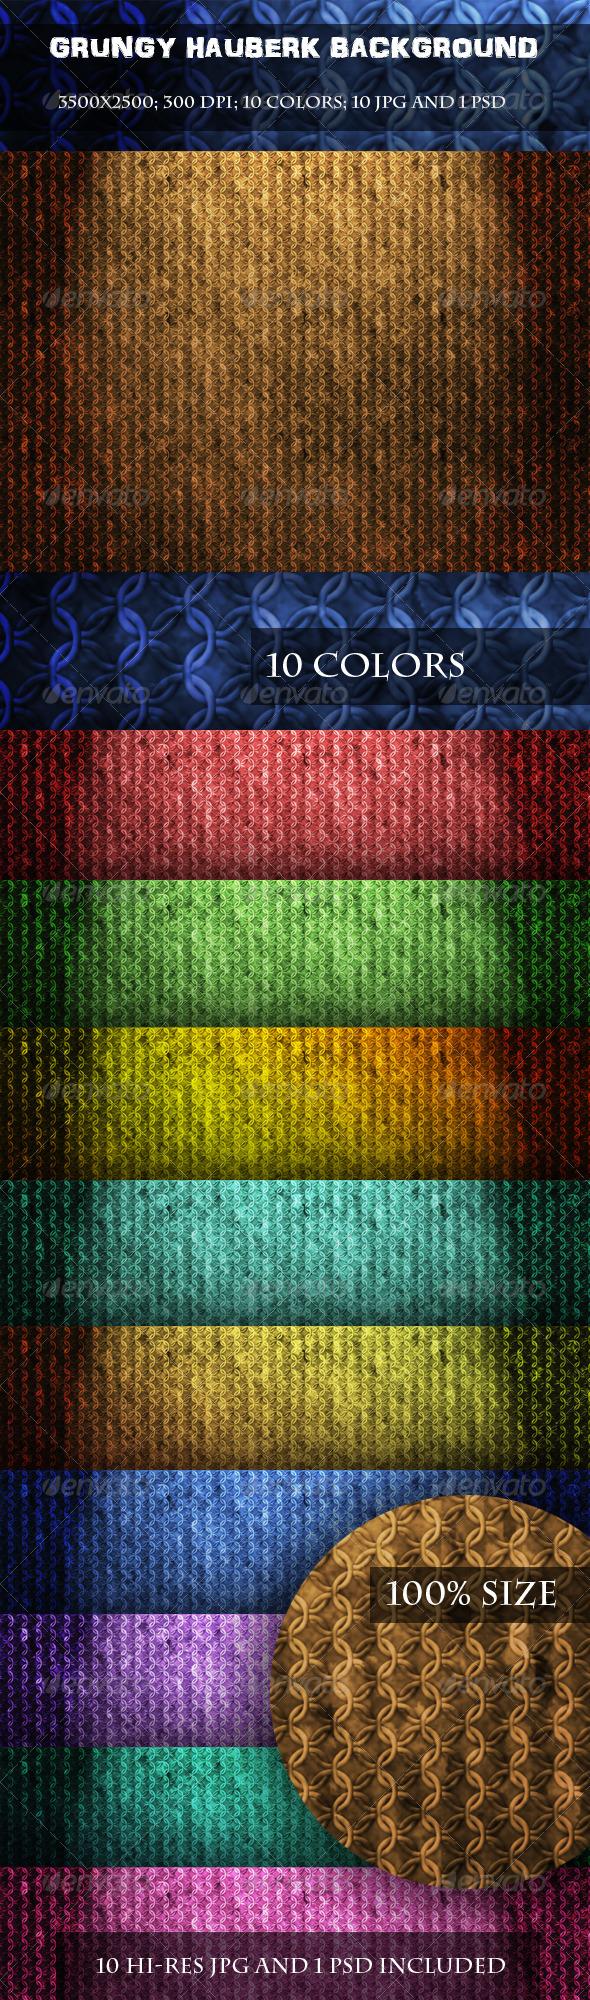 Grungy Hauberk Background - Patterns Backgrounds